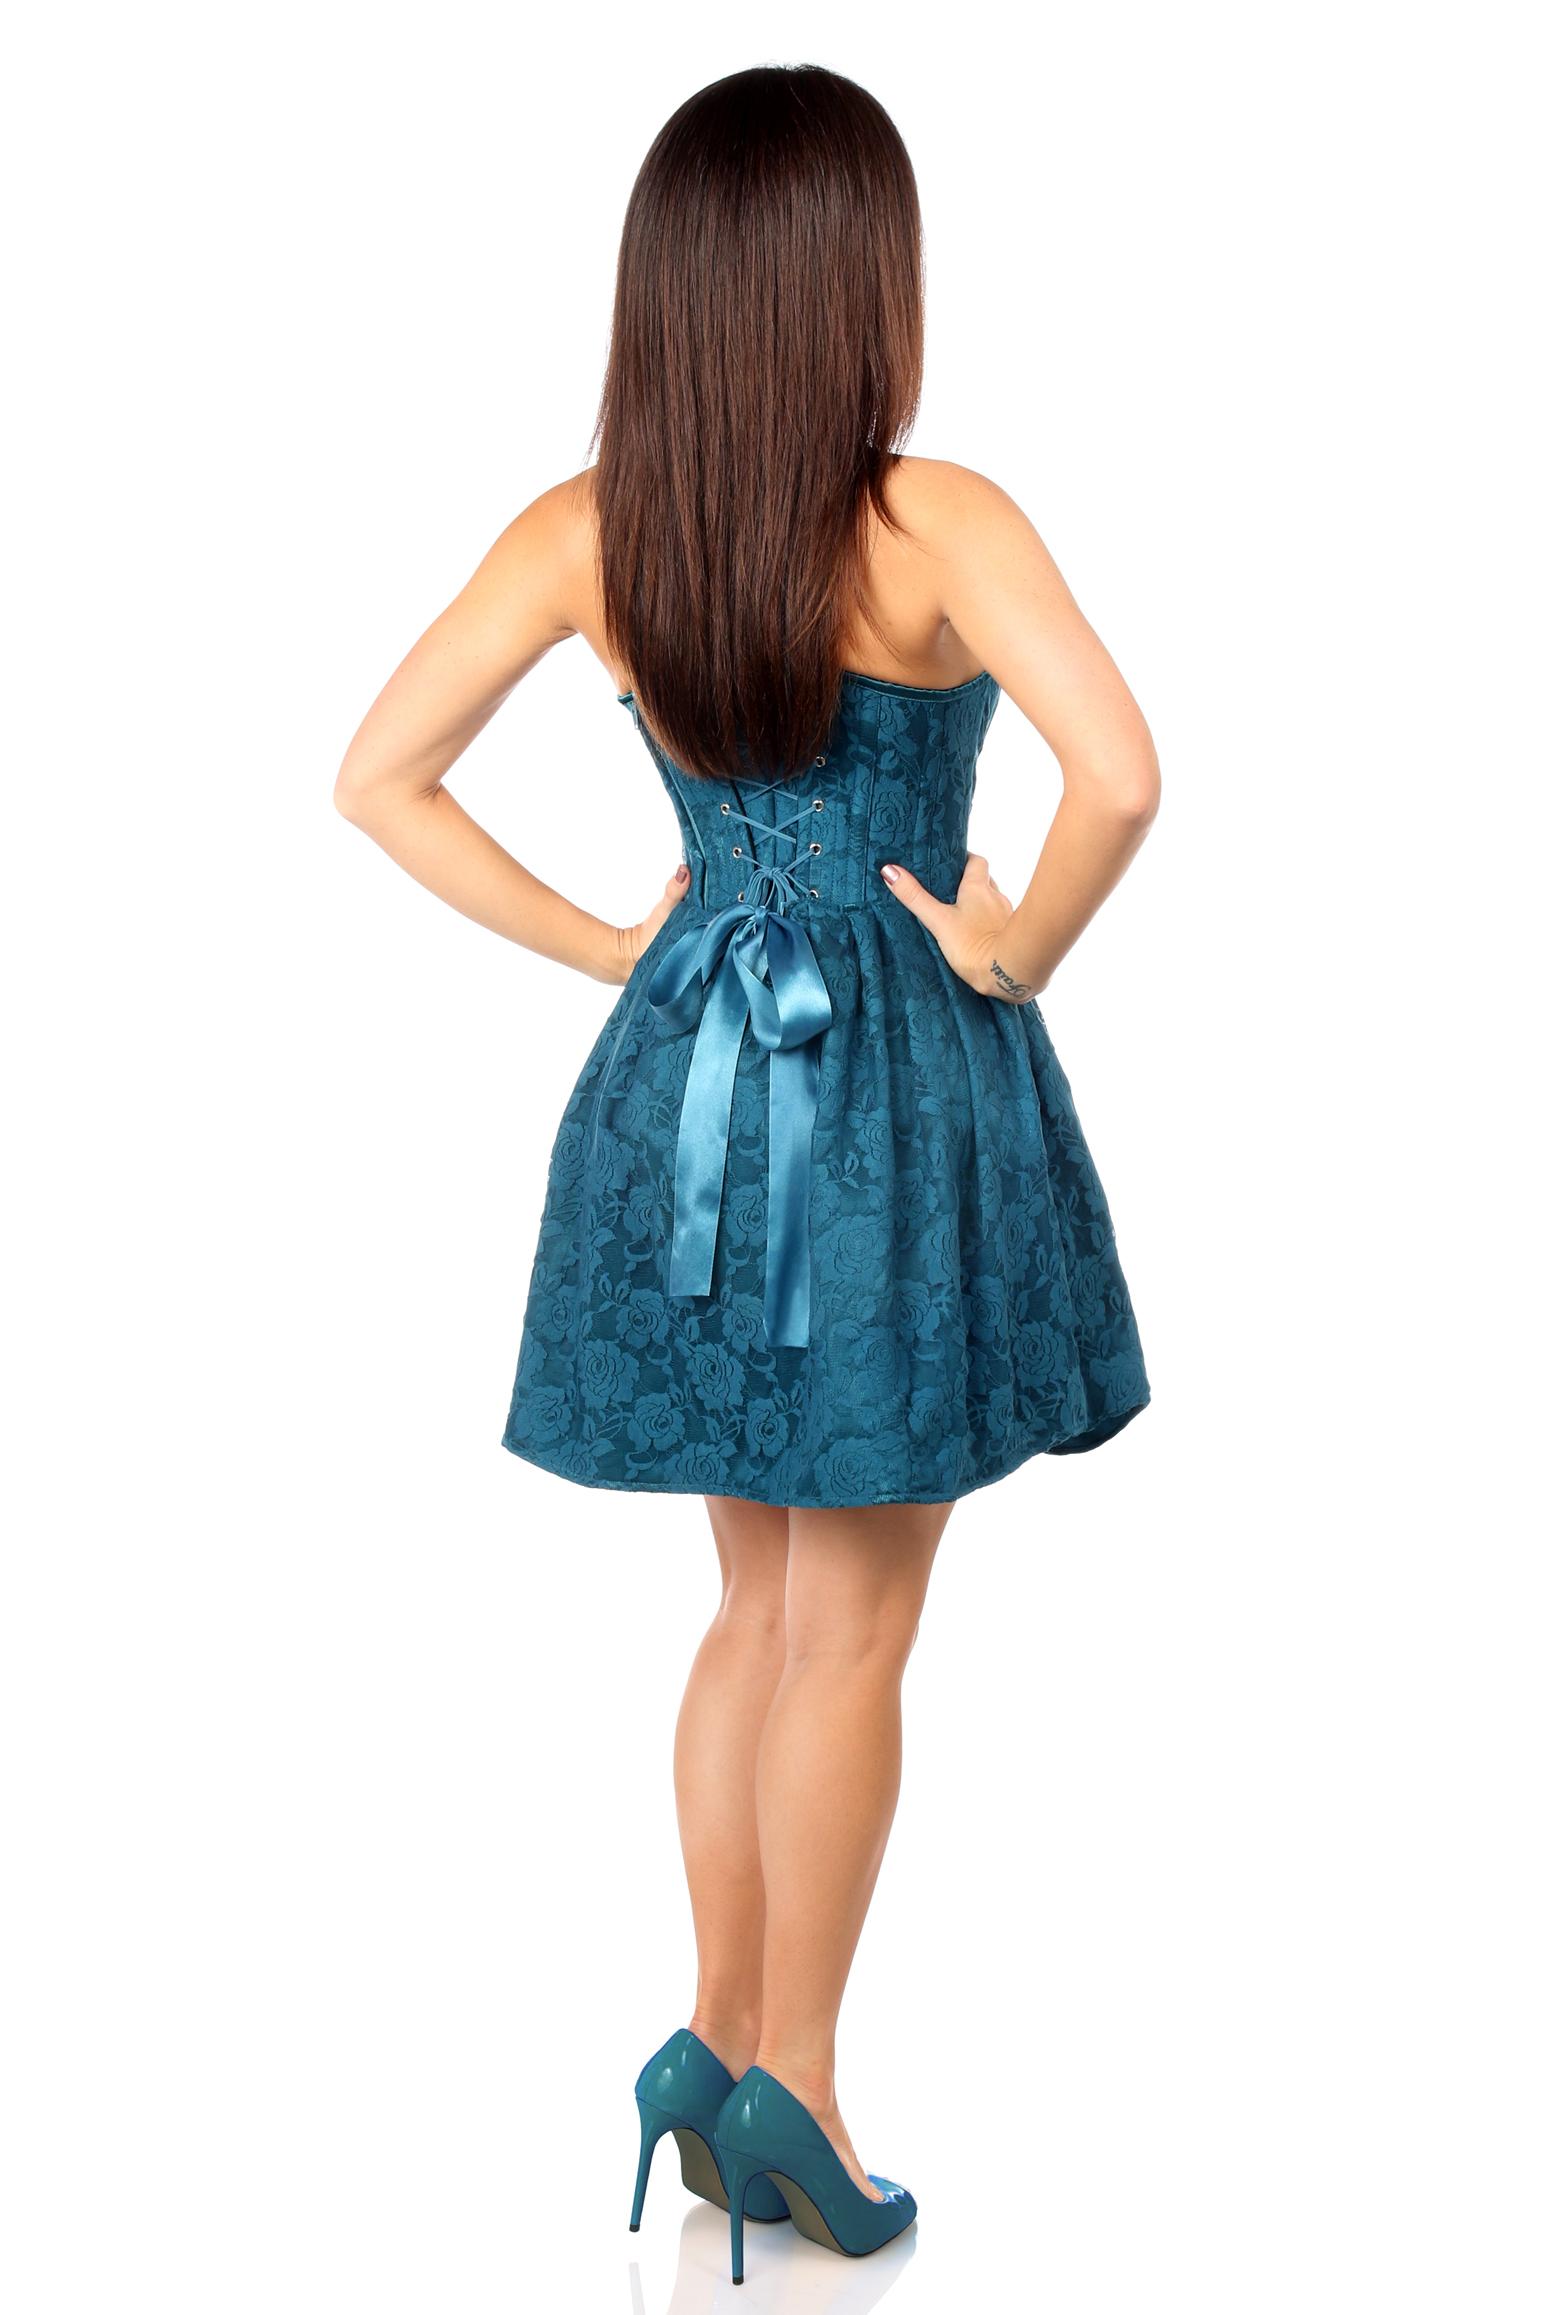 Top Drawer Steel Boned Dark Teal Lace Empire Waist Corset Dress DASTD-594